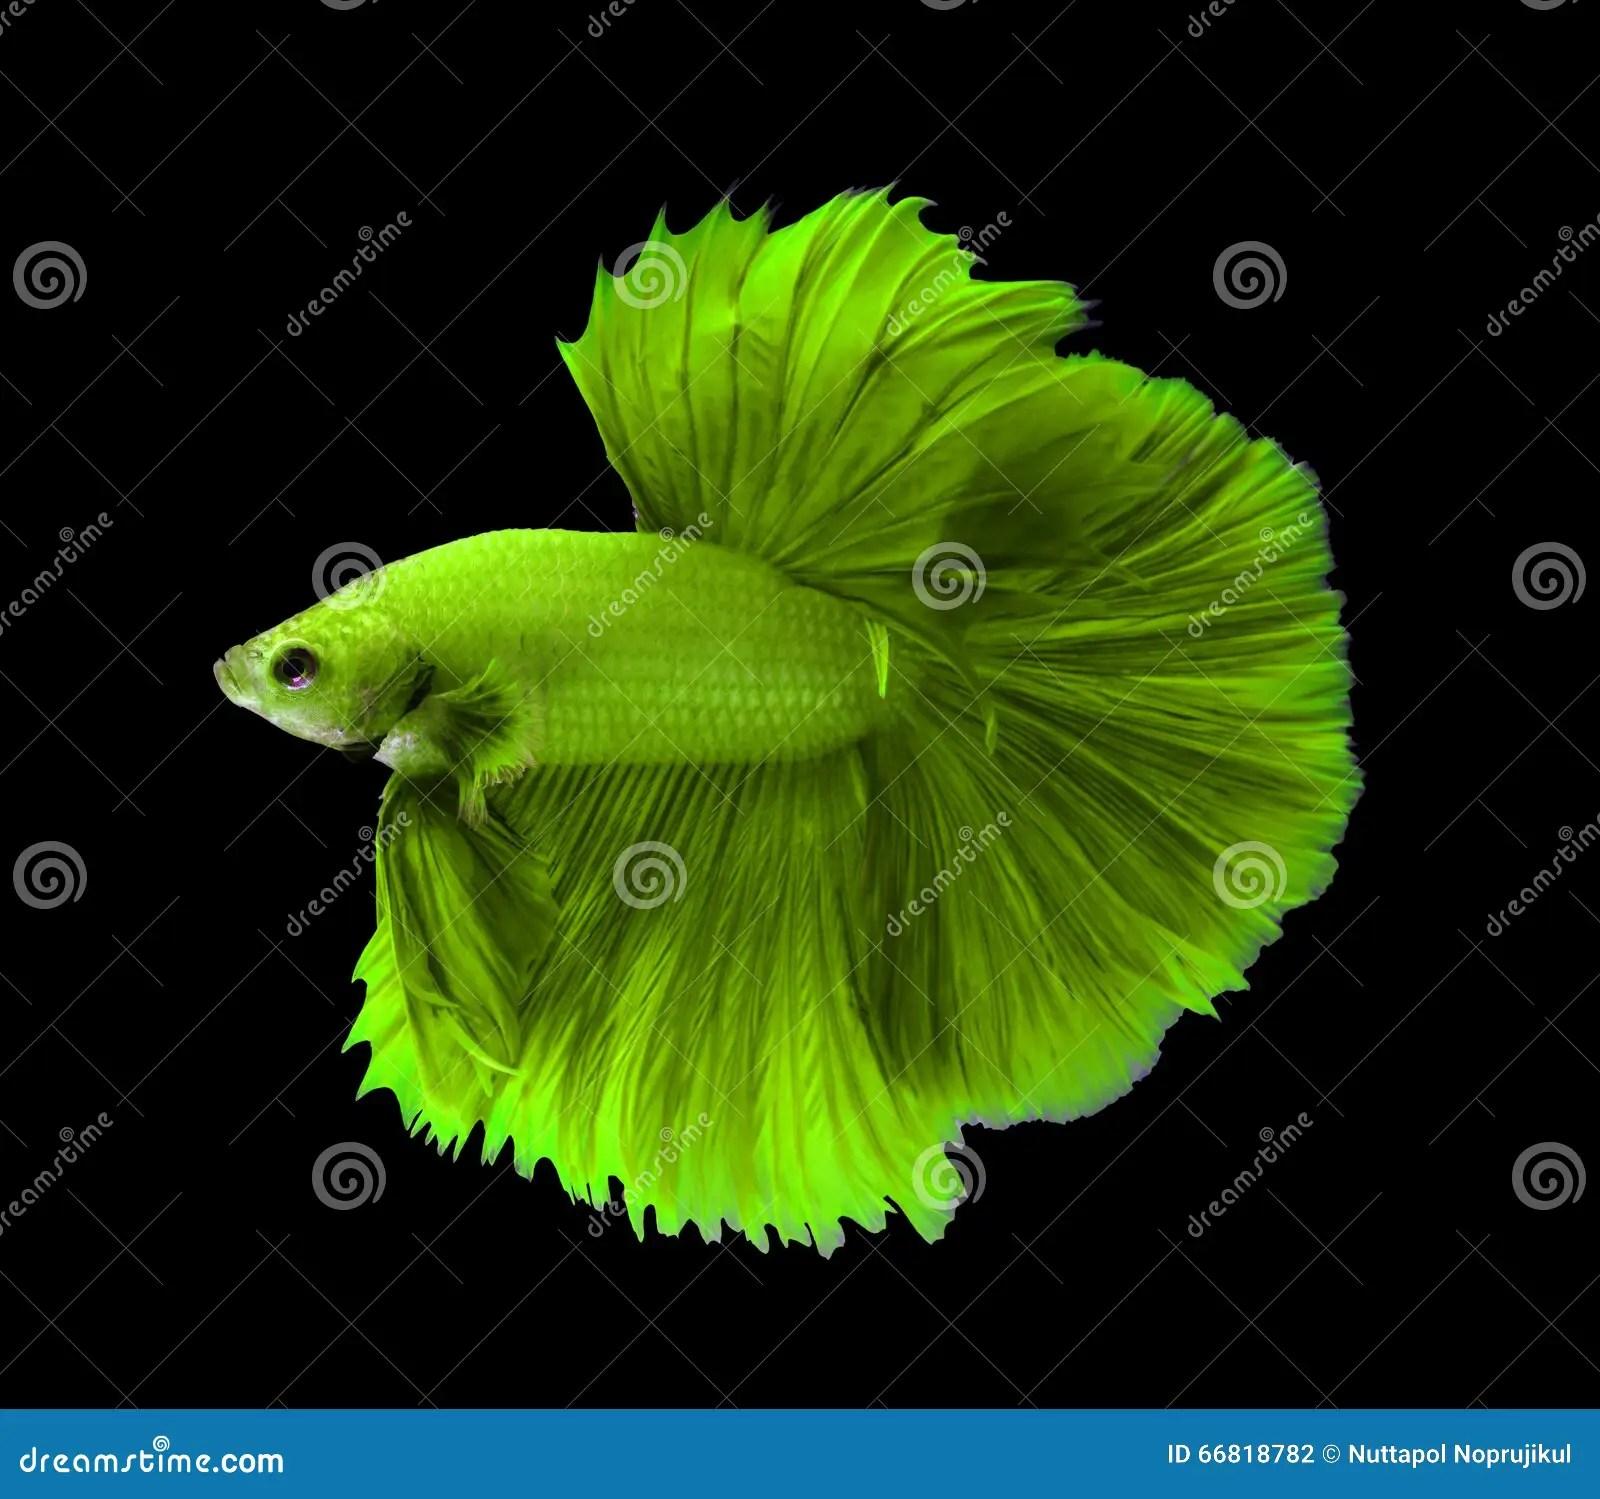 Fighter Fish Hd Wallpaper Download Green Siamese Fighting Fish Halfmoon Betta Fish Isolated